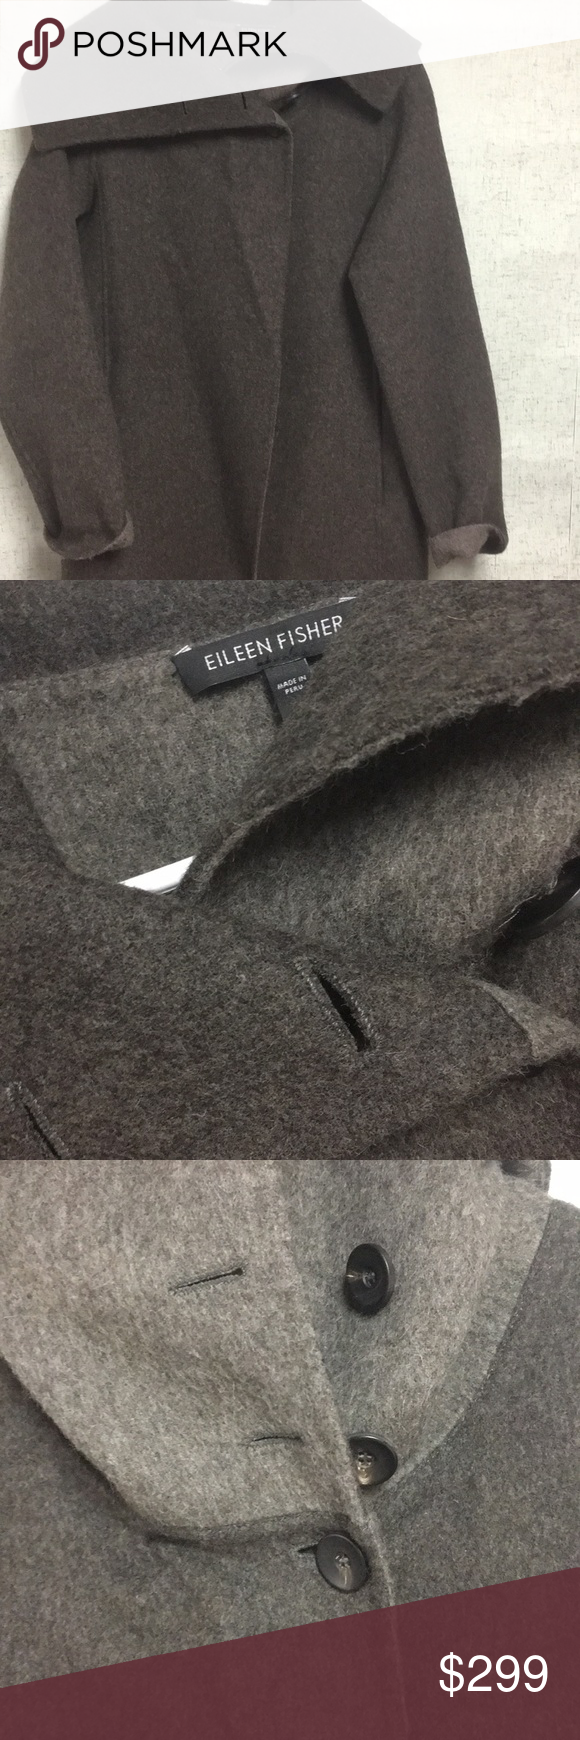 Eileen Fisher Xs High Double Face Coat Baby Alpaca Alpaca Wool Blend 17 Inches Underarm To Underarm And 35 In Le Eileen Fisher Jacket Eileen Fisher Baby Alpaca [ 1740 x 580 Pixel ]